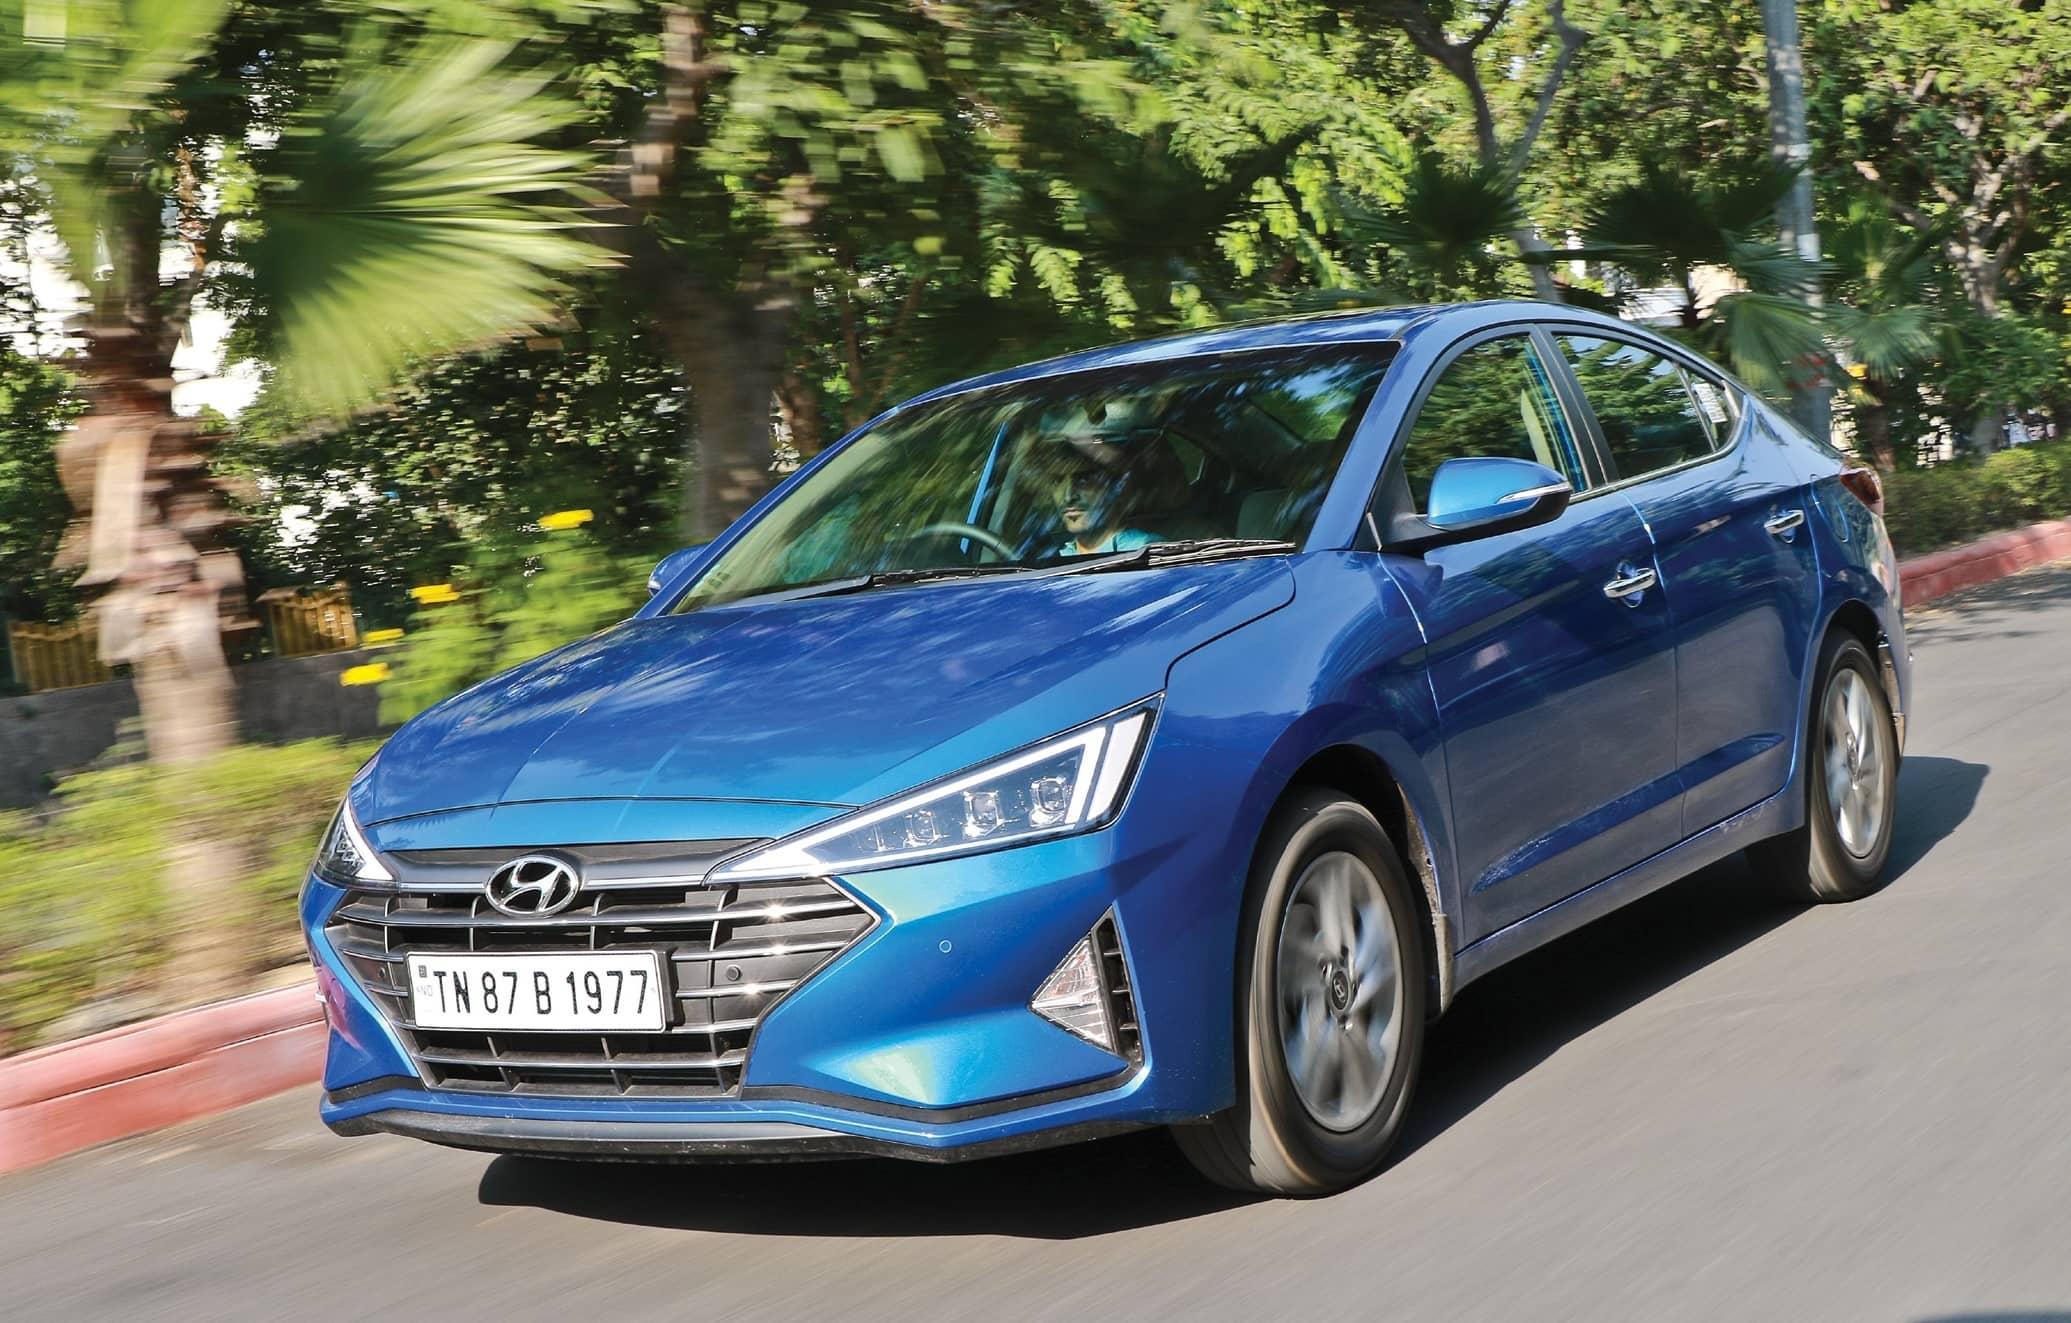 Hyundai Elantra Gets A Mid-Life Facelift